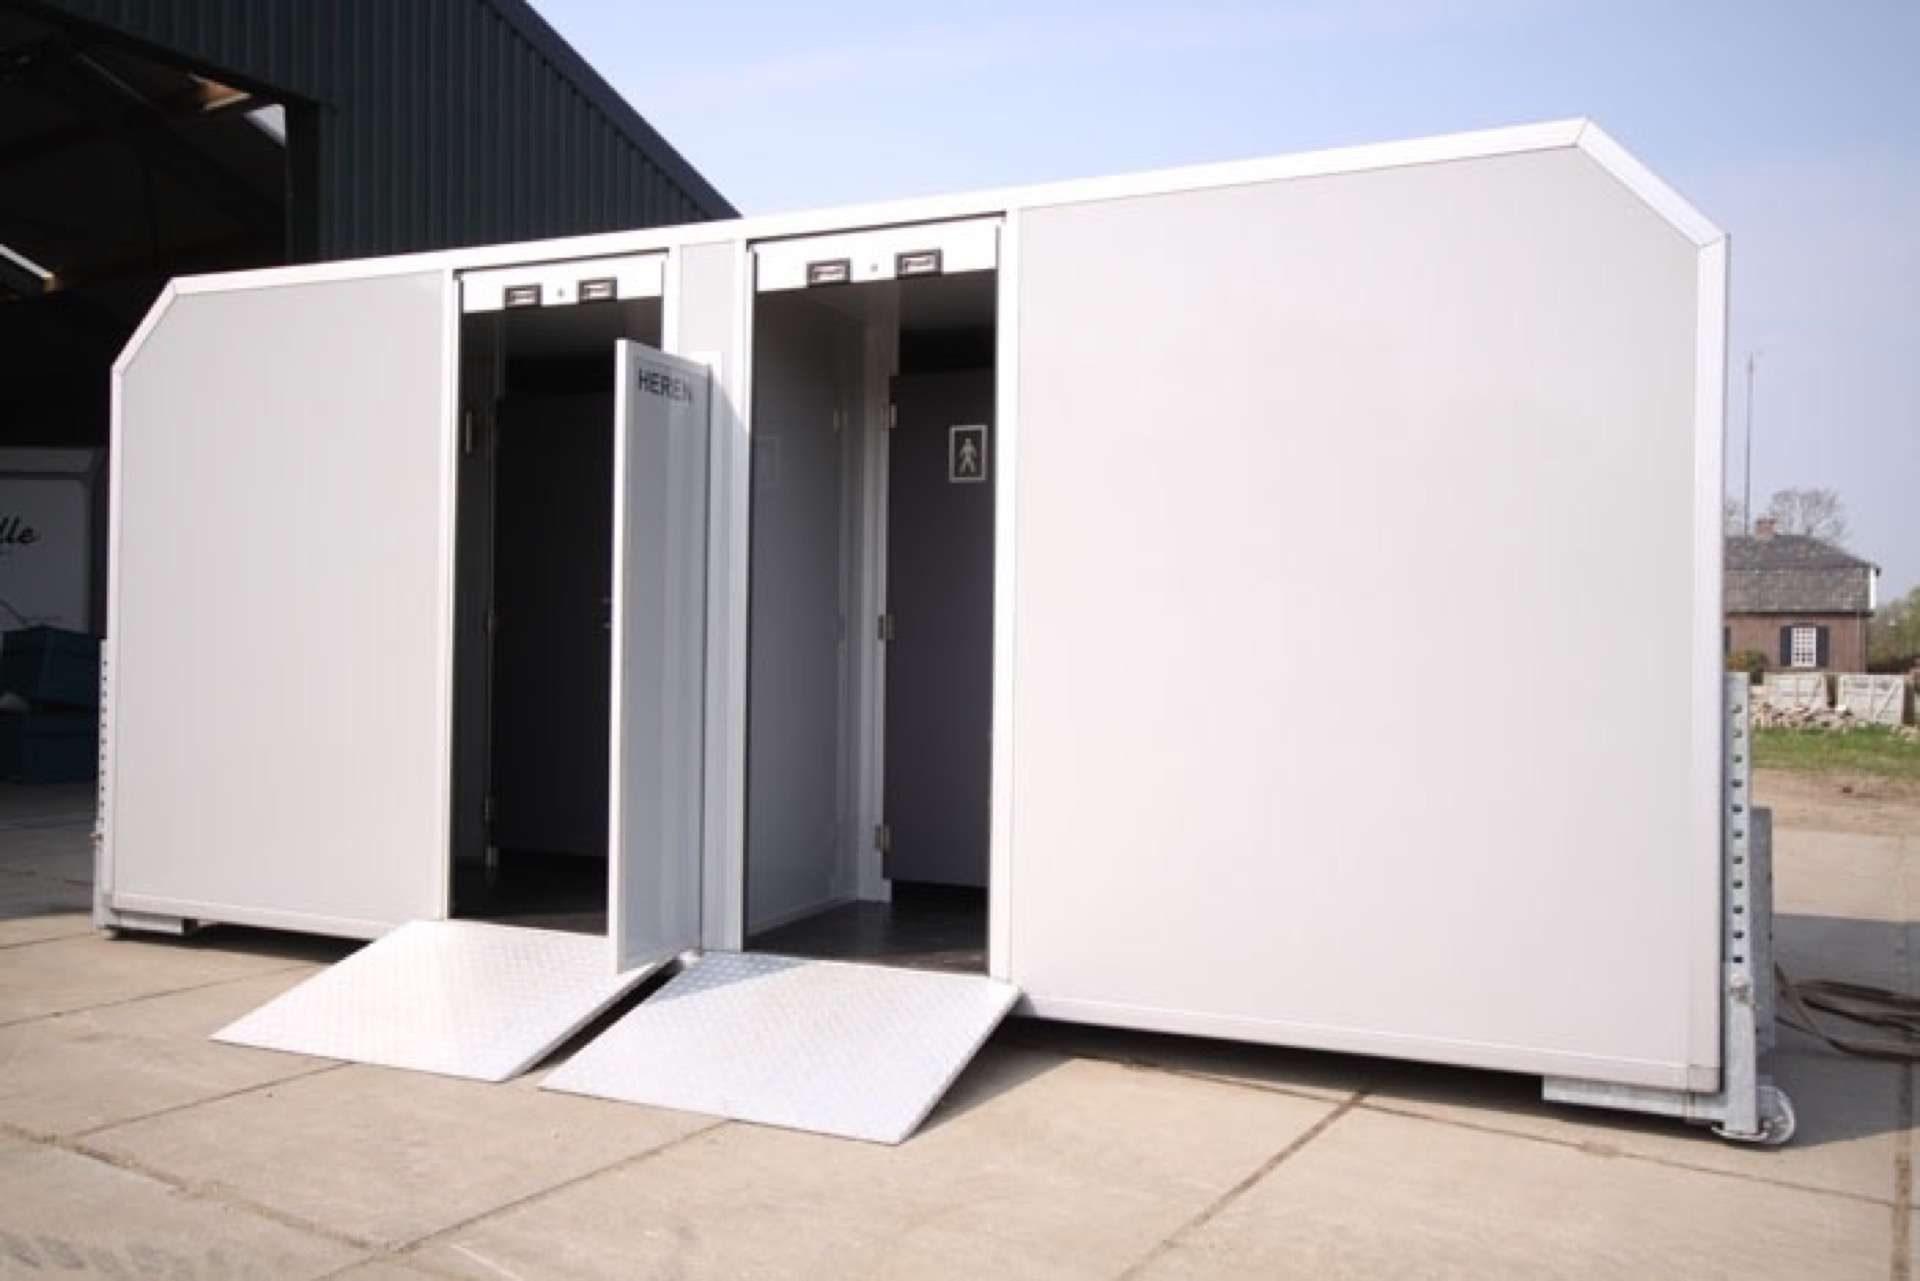 Toiletwagens - ATB - Tentenverhuur